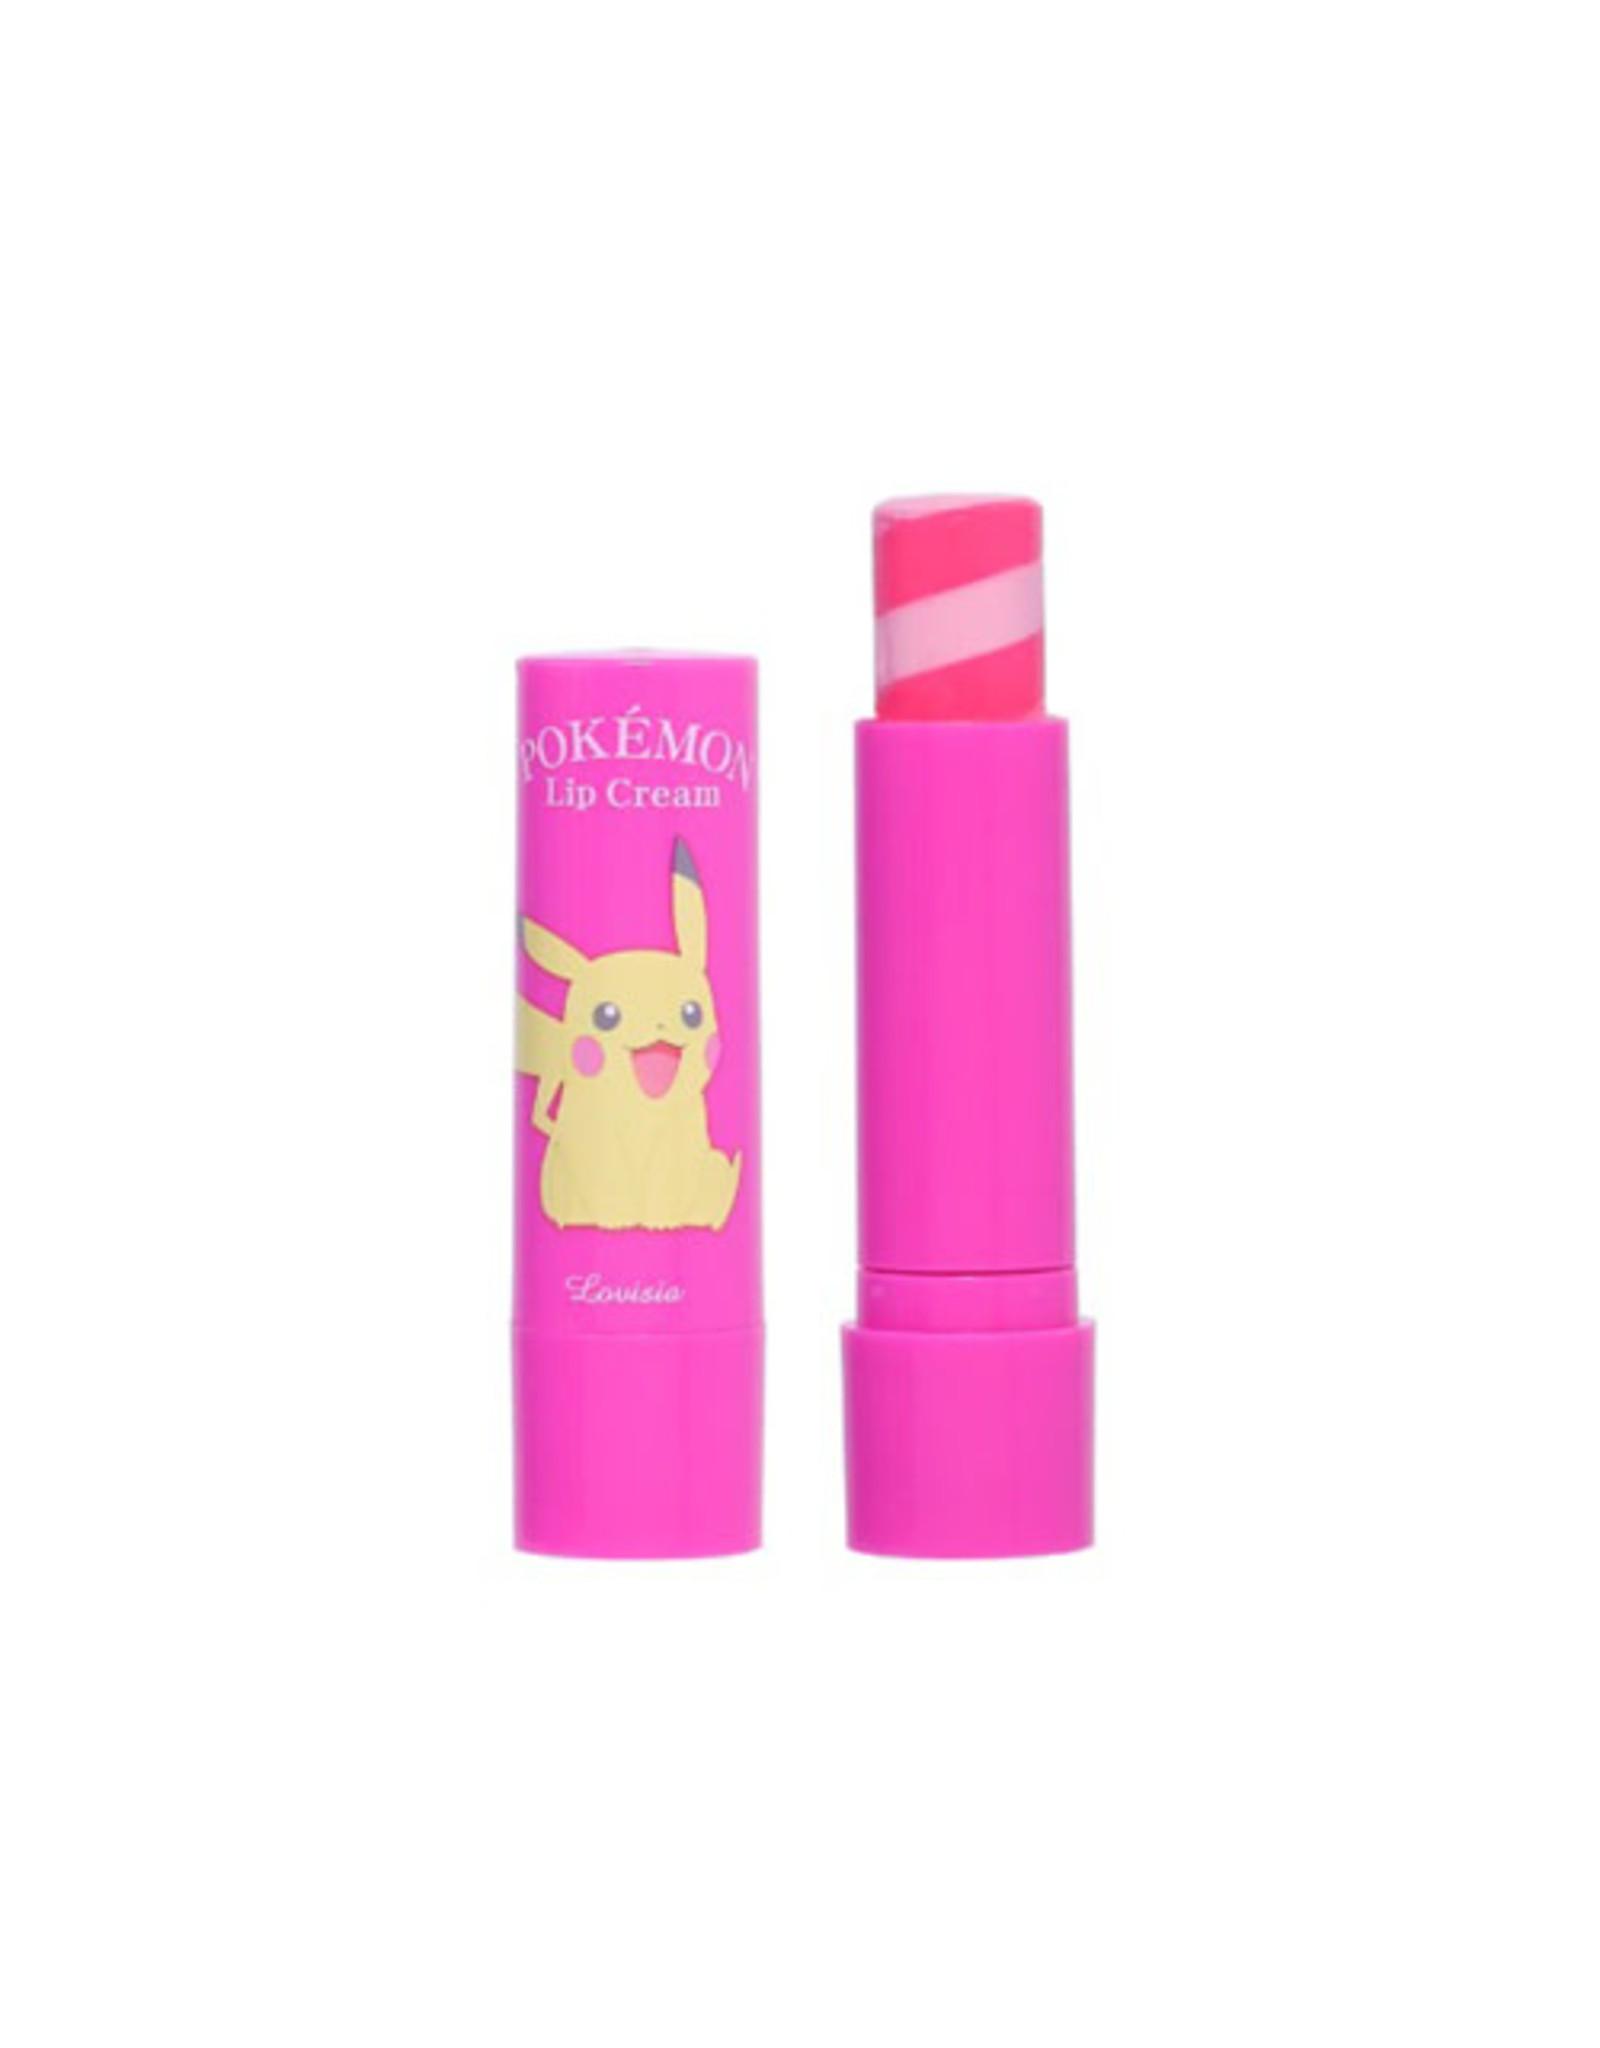 Pokemon Lip Cream